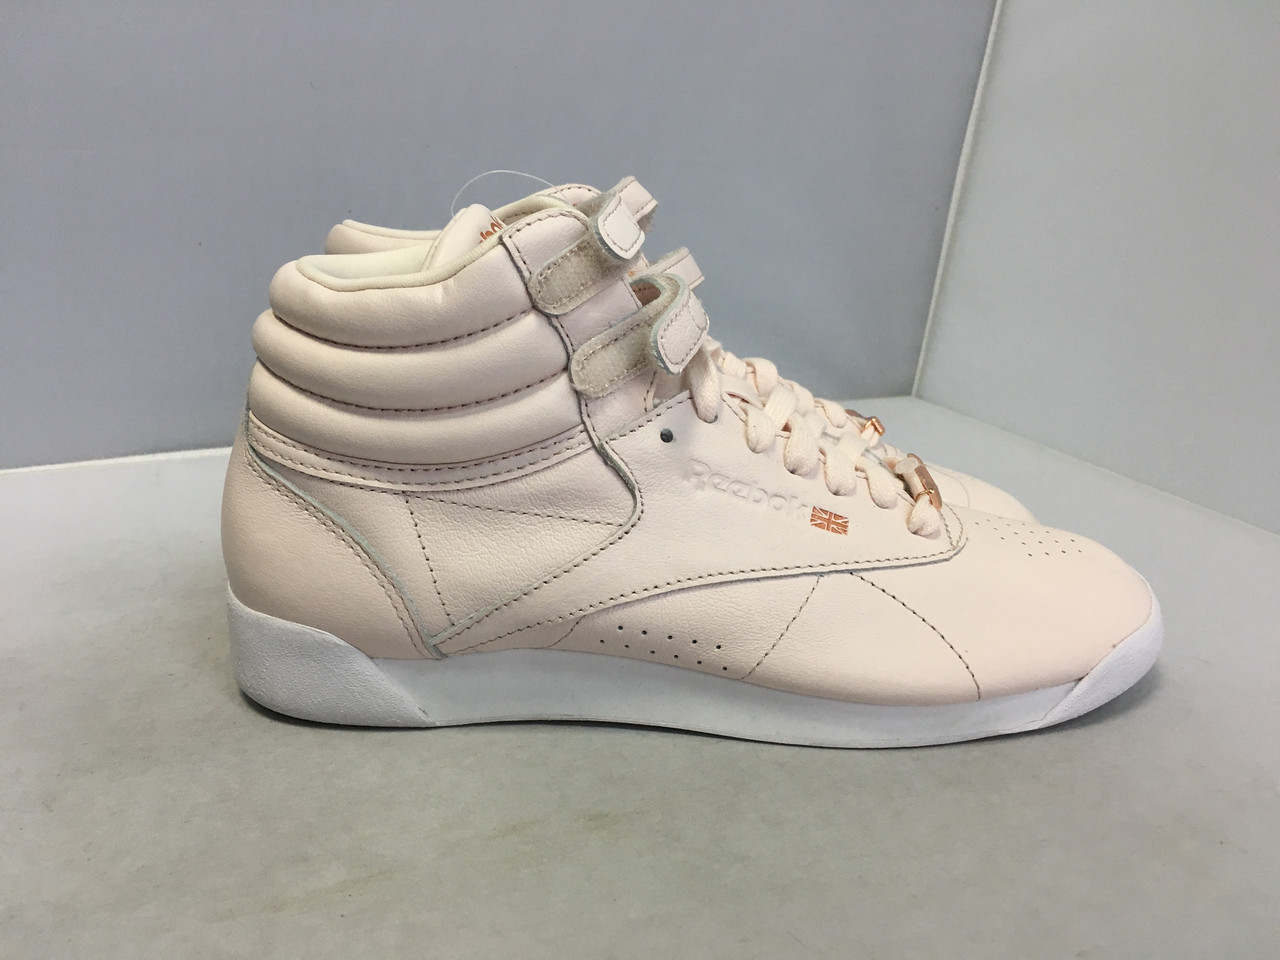 Женские ботинки Reebok, 38 размер, фото 1